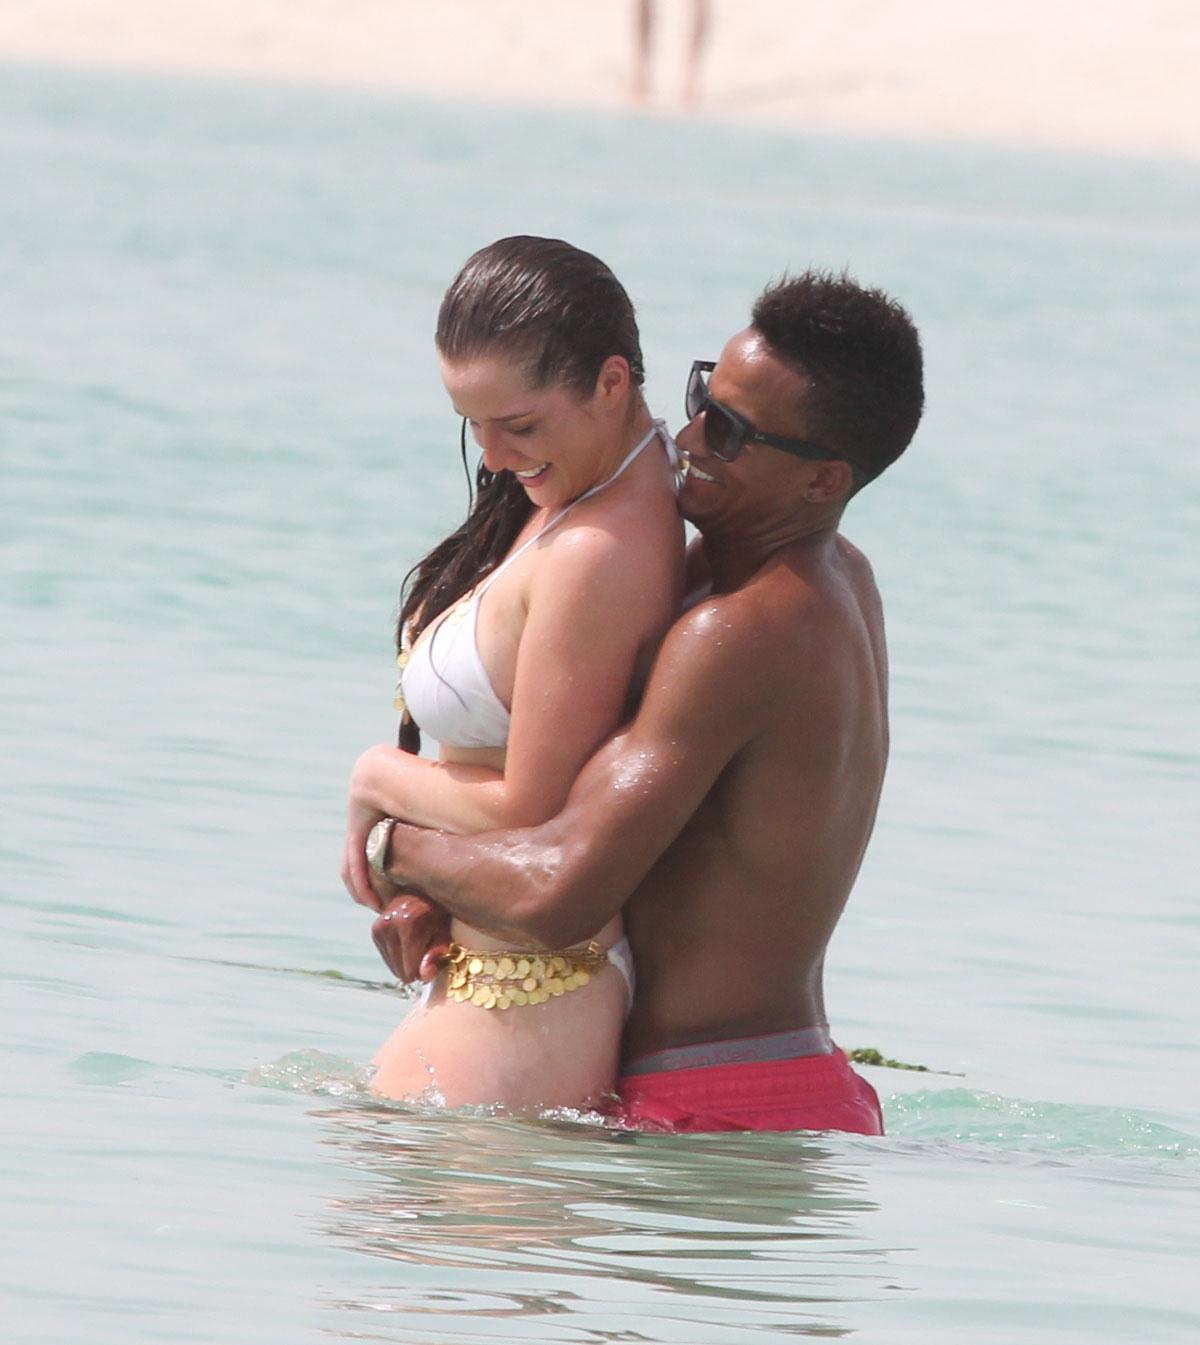 Helen Flanagan In Bikini On The Beach In Dubai Hawtcelebs Hawtcelebs